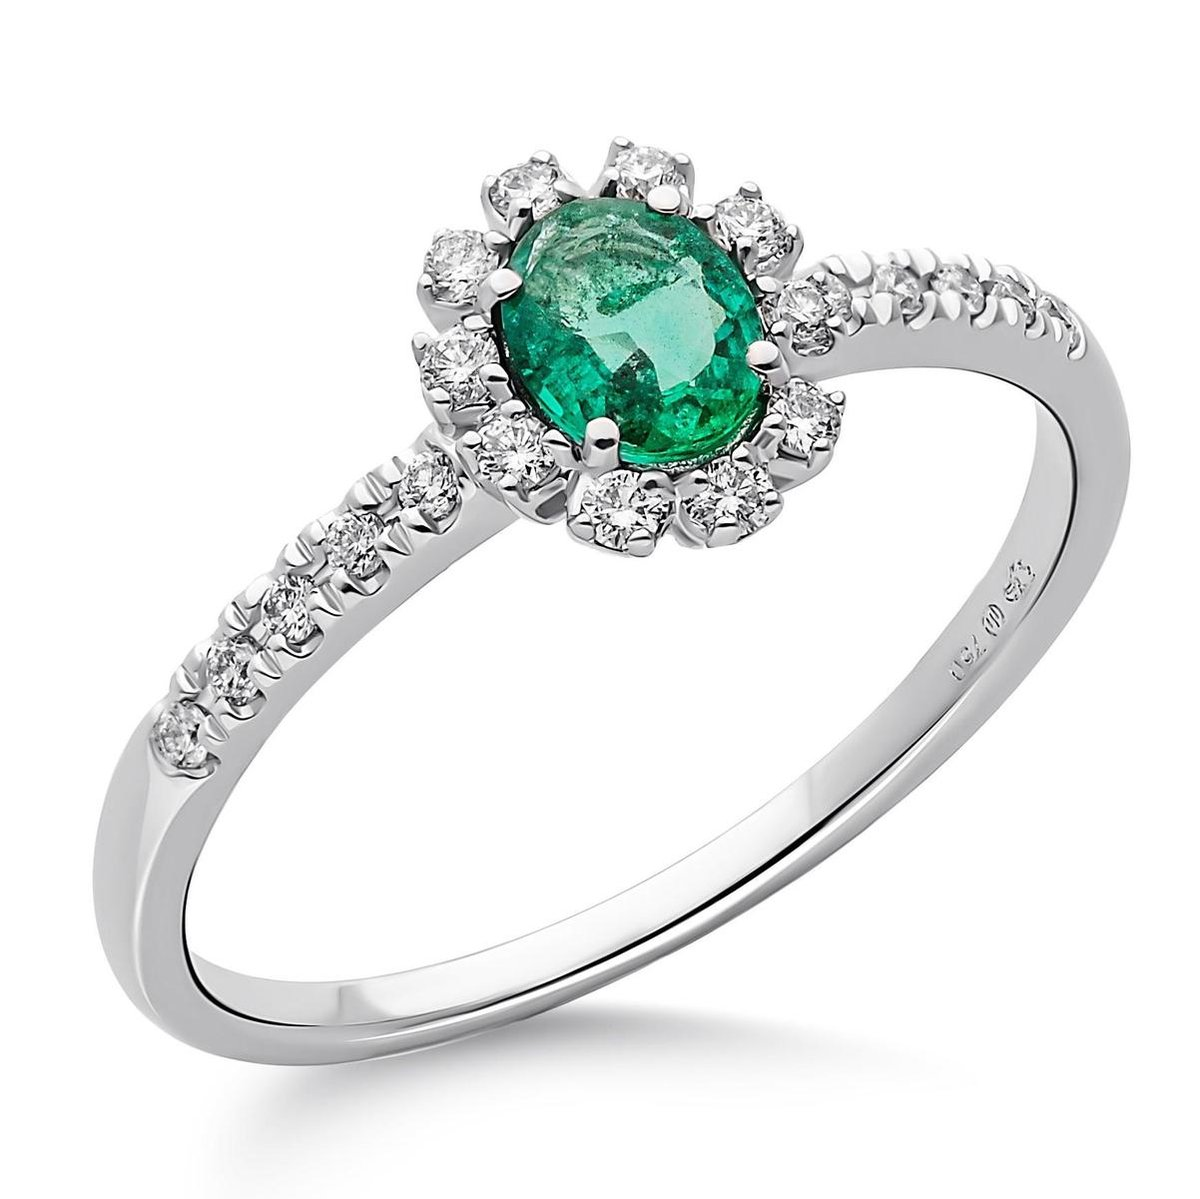 Orphelia RD-3928/EM/60 - Ring - Witgoud 18 Karaat - Diamant 0.14 ct / Smaragd 0.31 ct